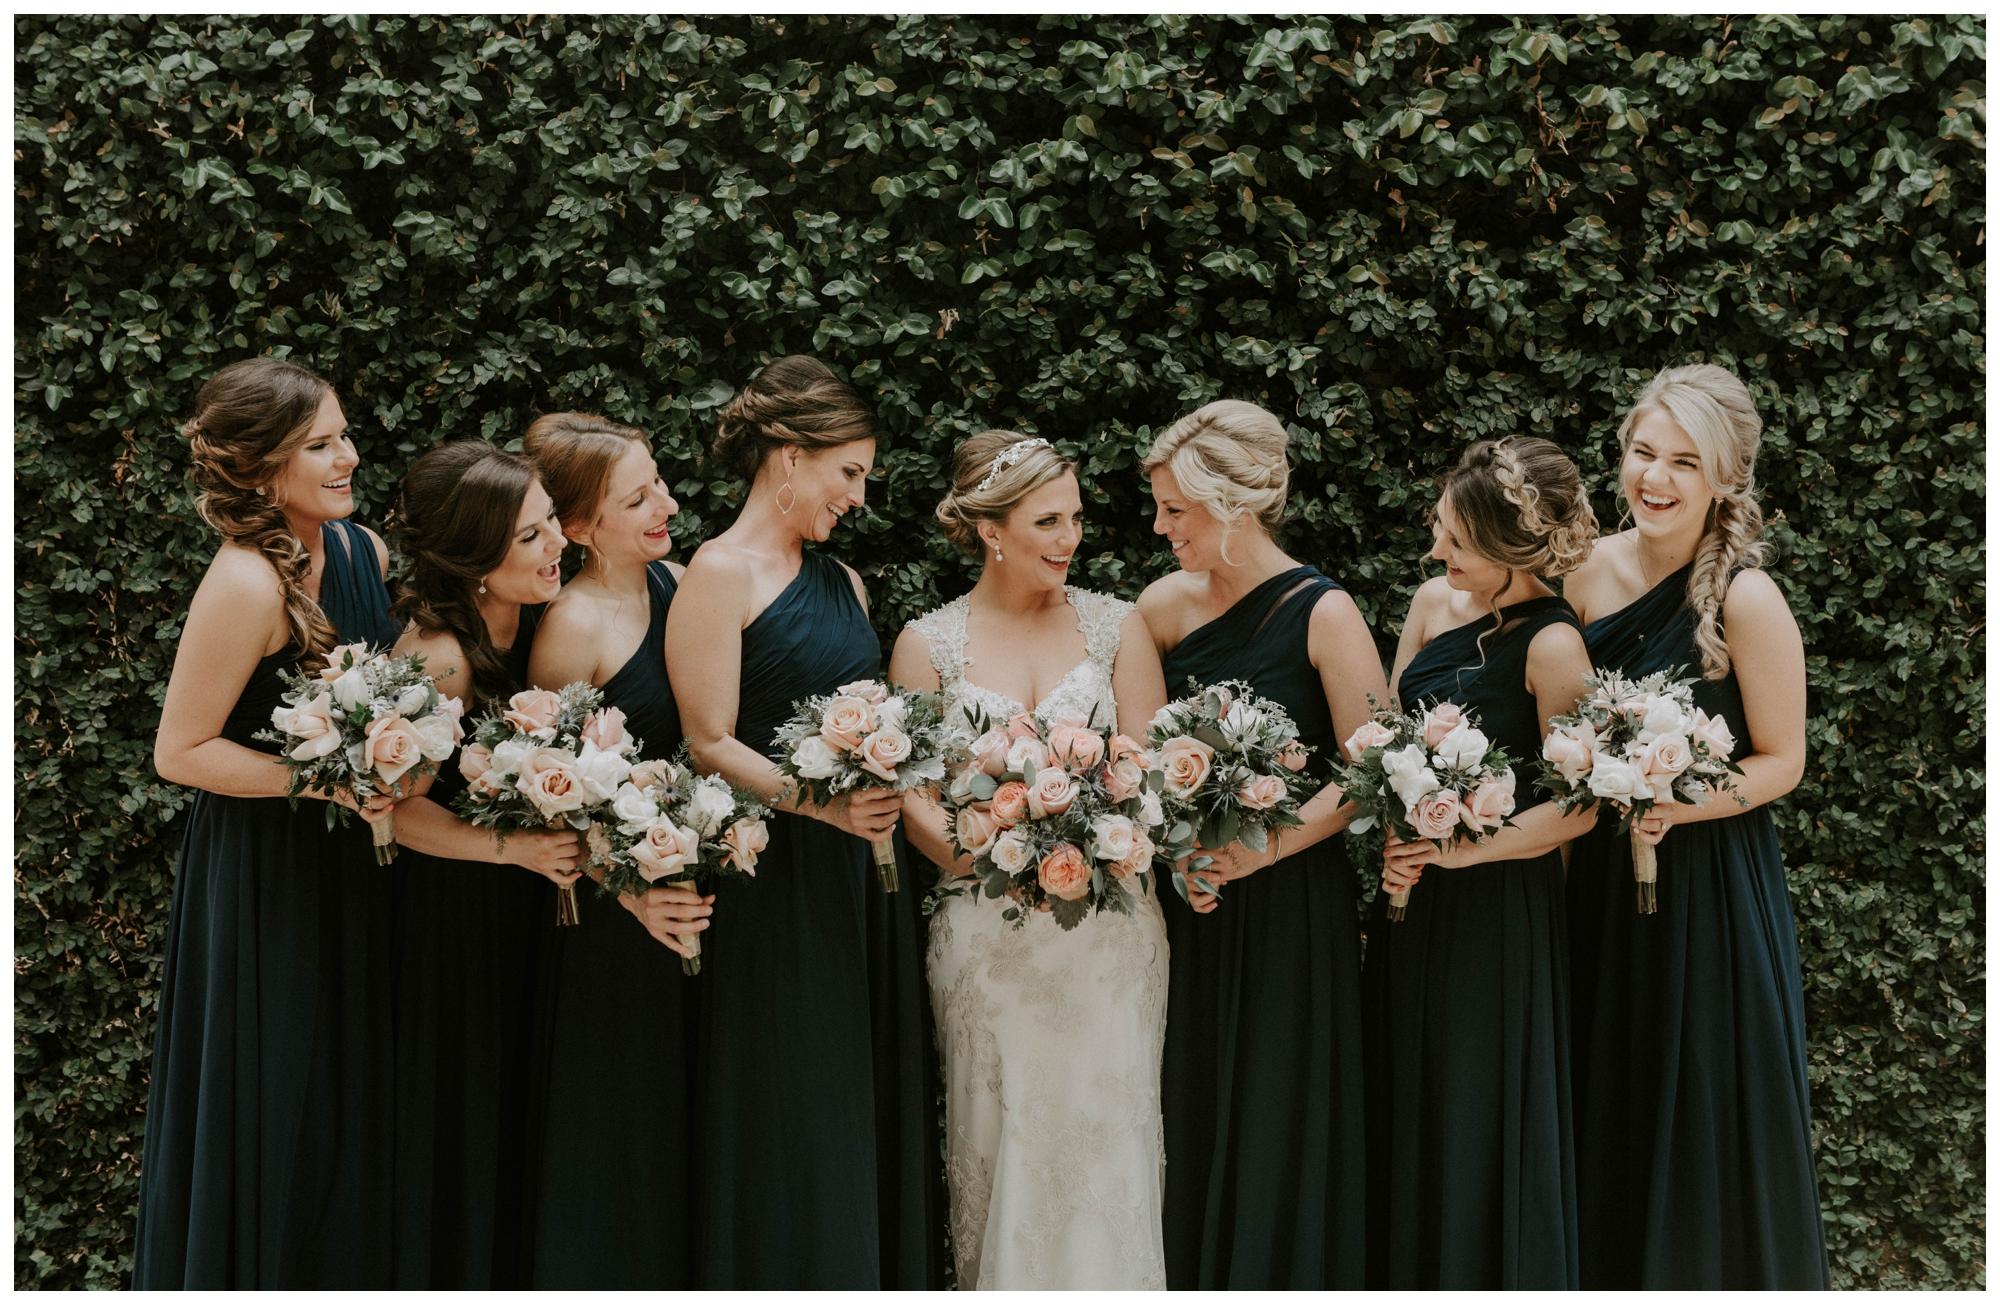 austin-texas-wedding-photography-1778-photographie_0037.jpg